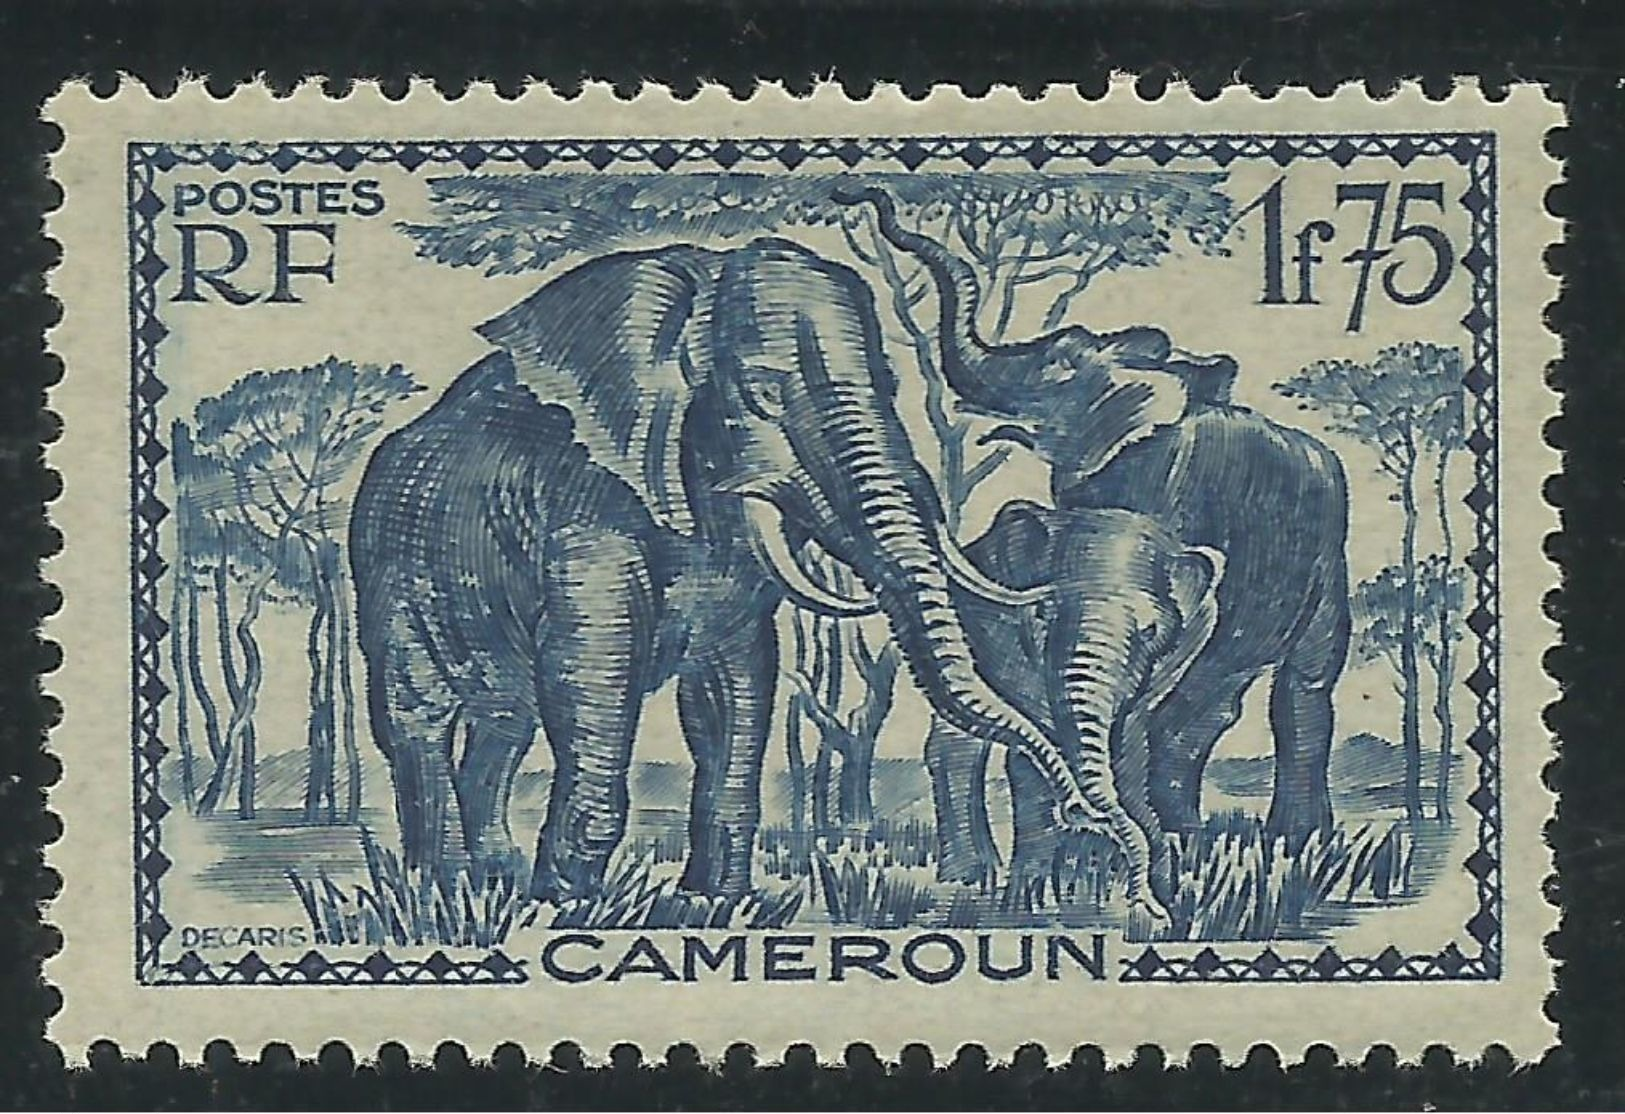 CAMEROUN 1939 YT 184** SANS TRACE DE CHARNIERE - Cameroun (1915-1959)